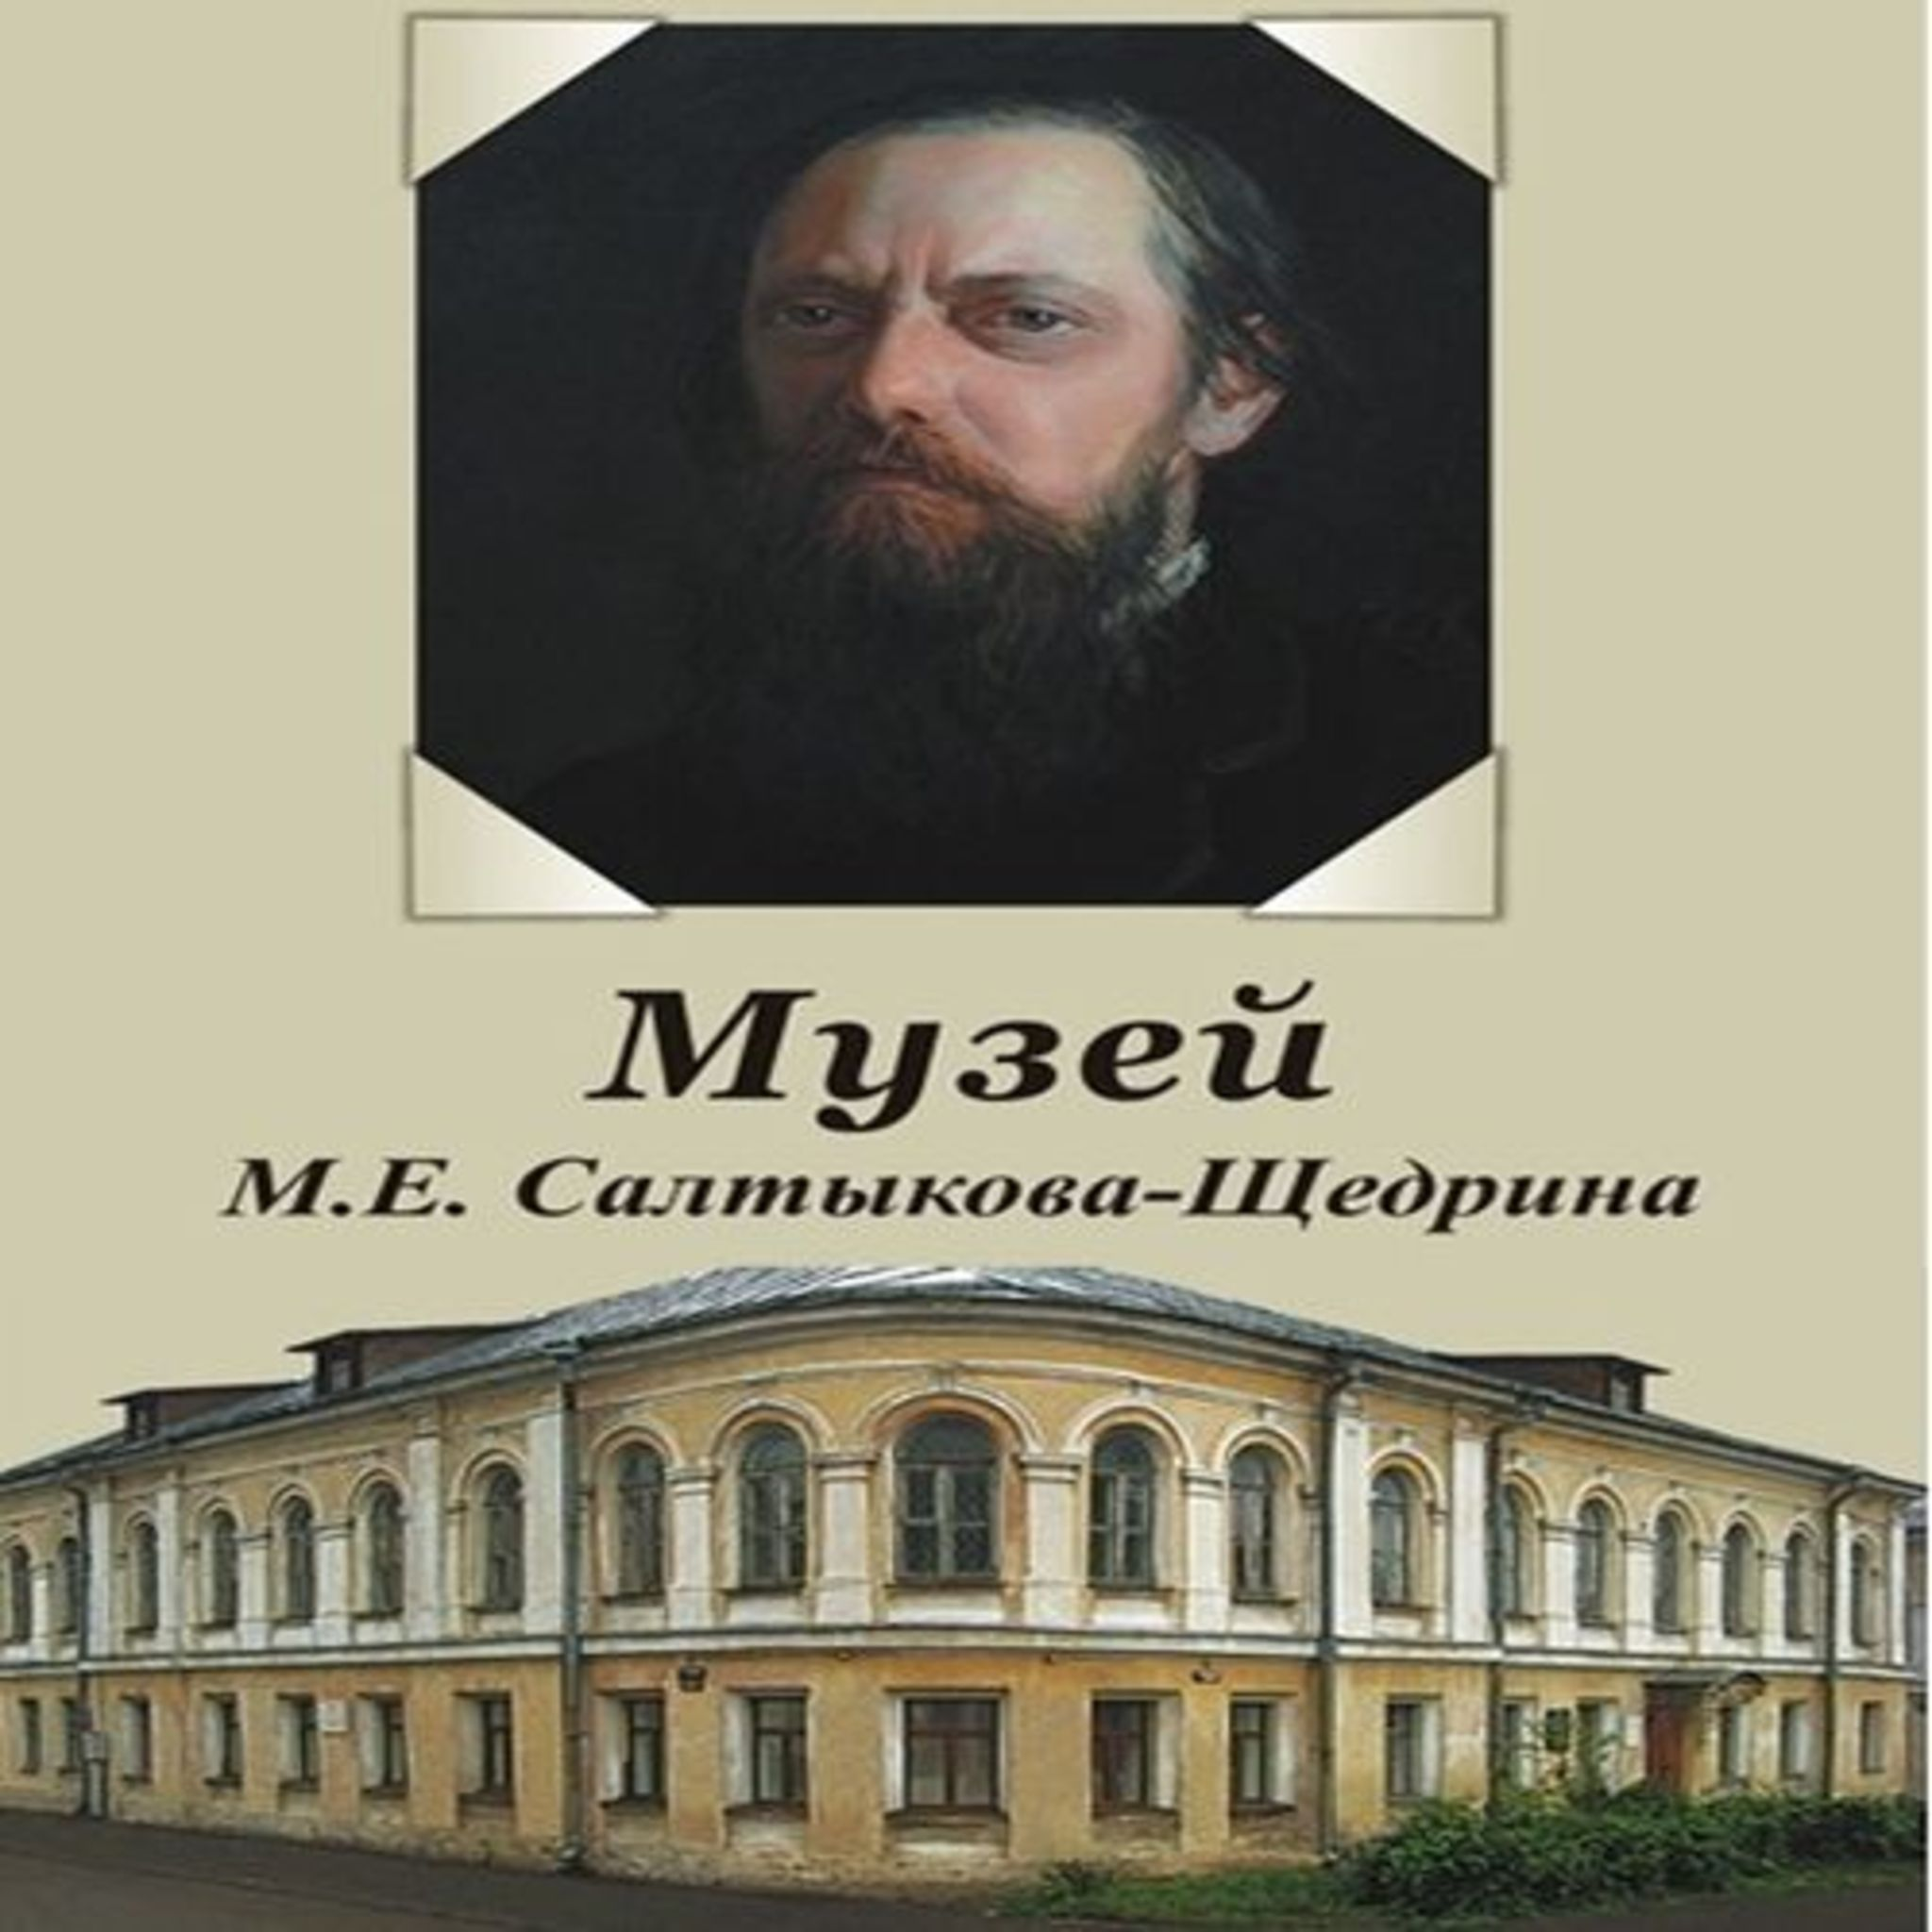 Museum of Saltykov-Shchedrin